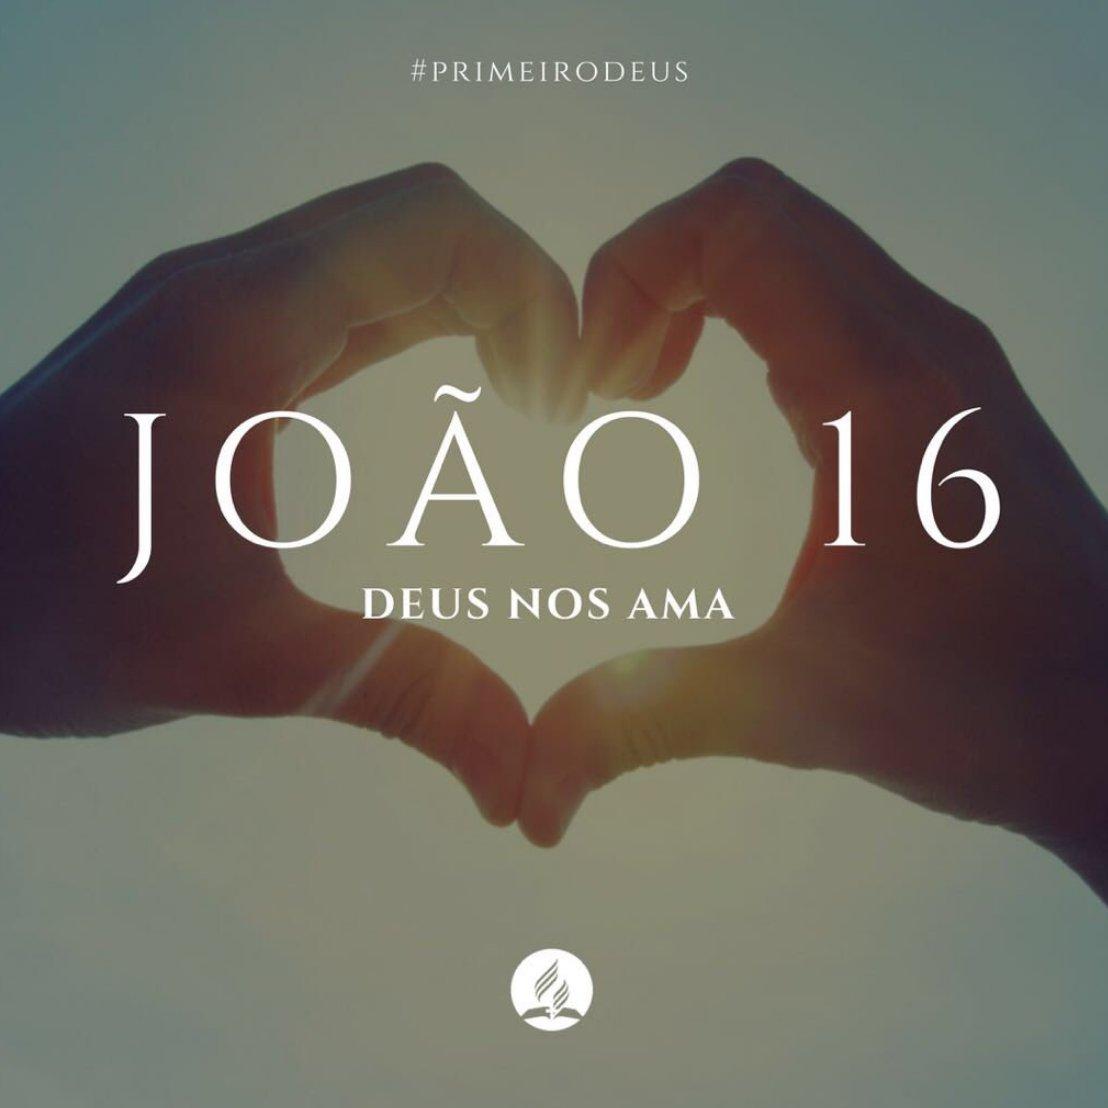 RT @mperezschulz: Jesus loves us - John 16  Jesús nos ama - Juan 16  #GodFirst #PrimeroDios #RpSp #RbHw https://t.co/PmwQ3MLjDu